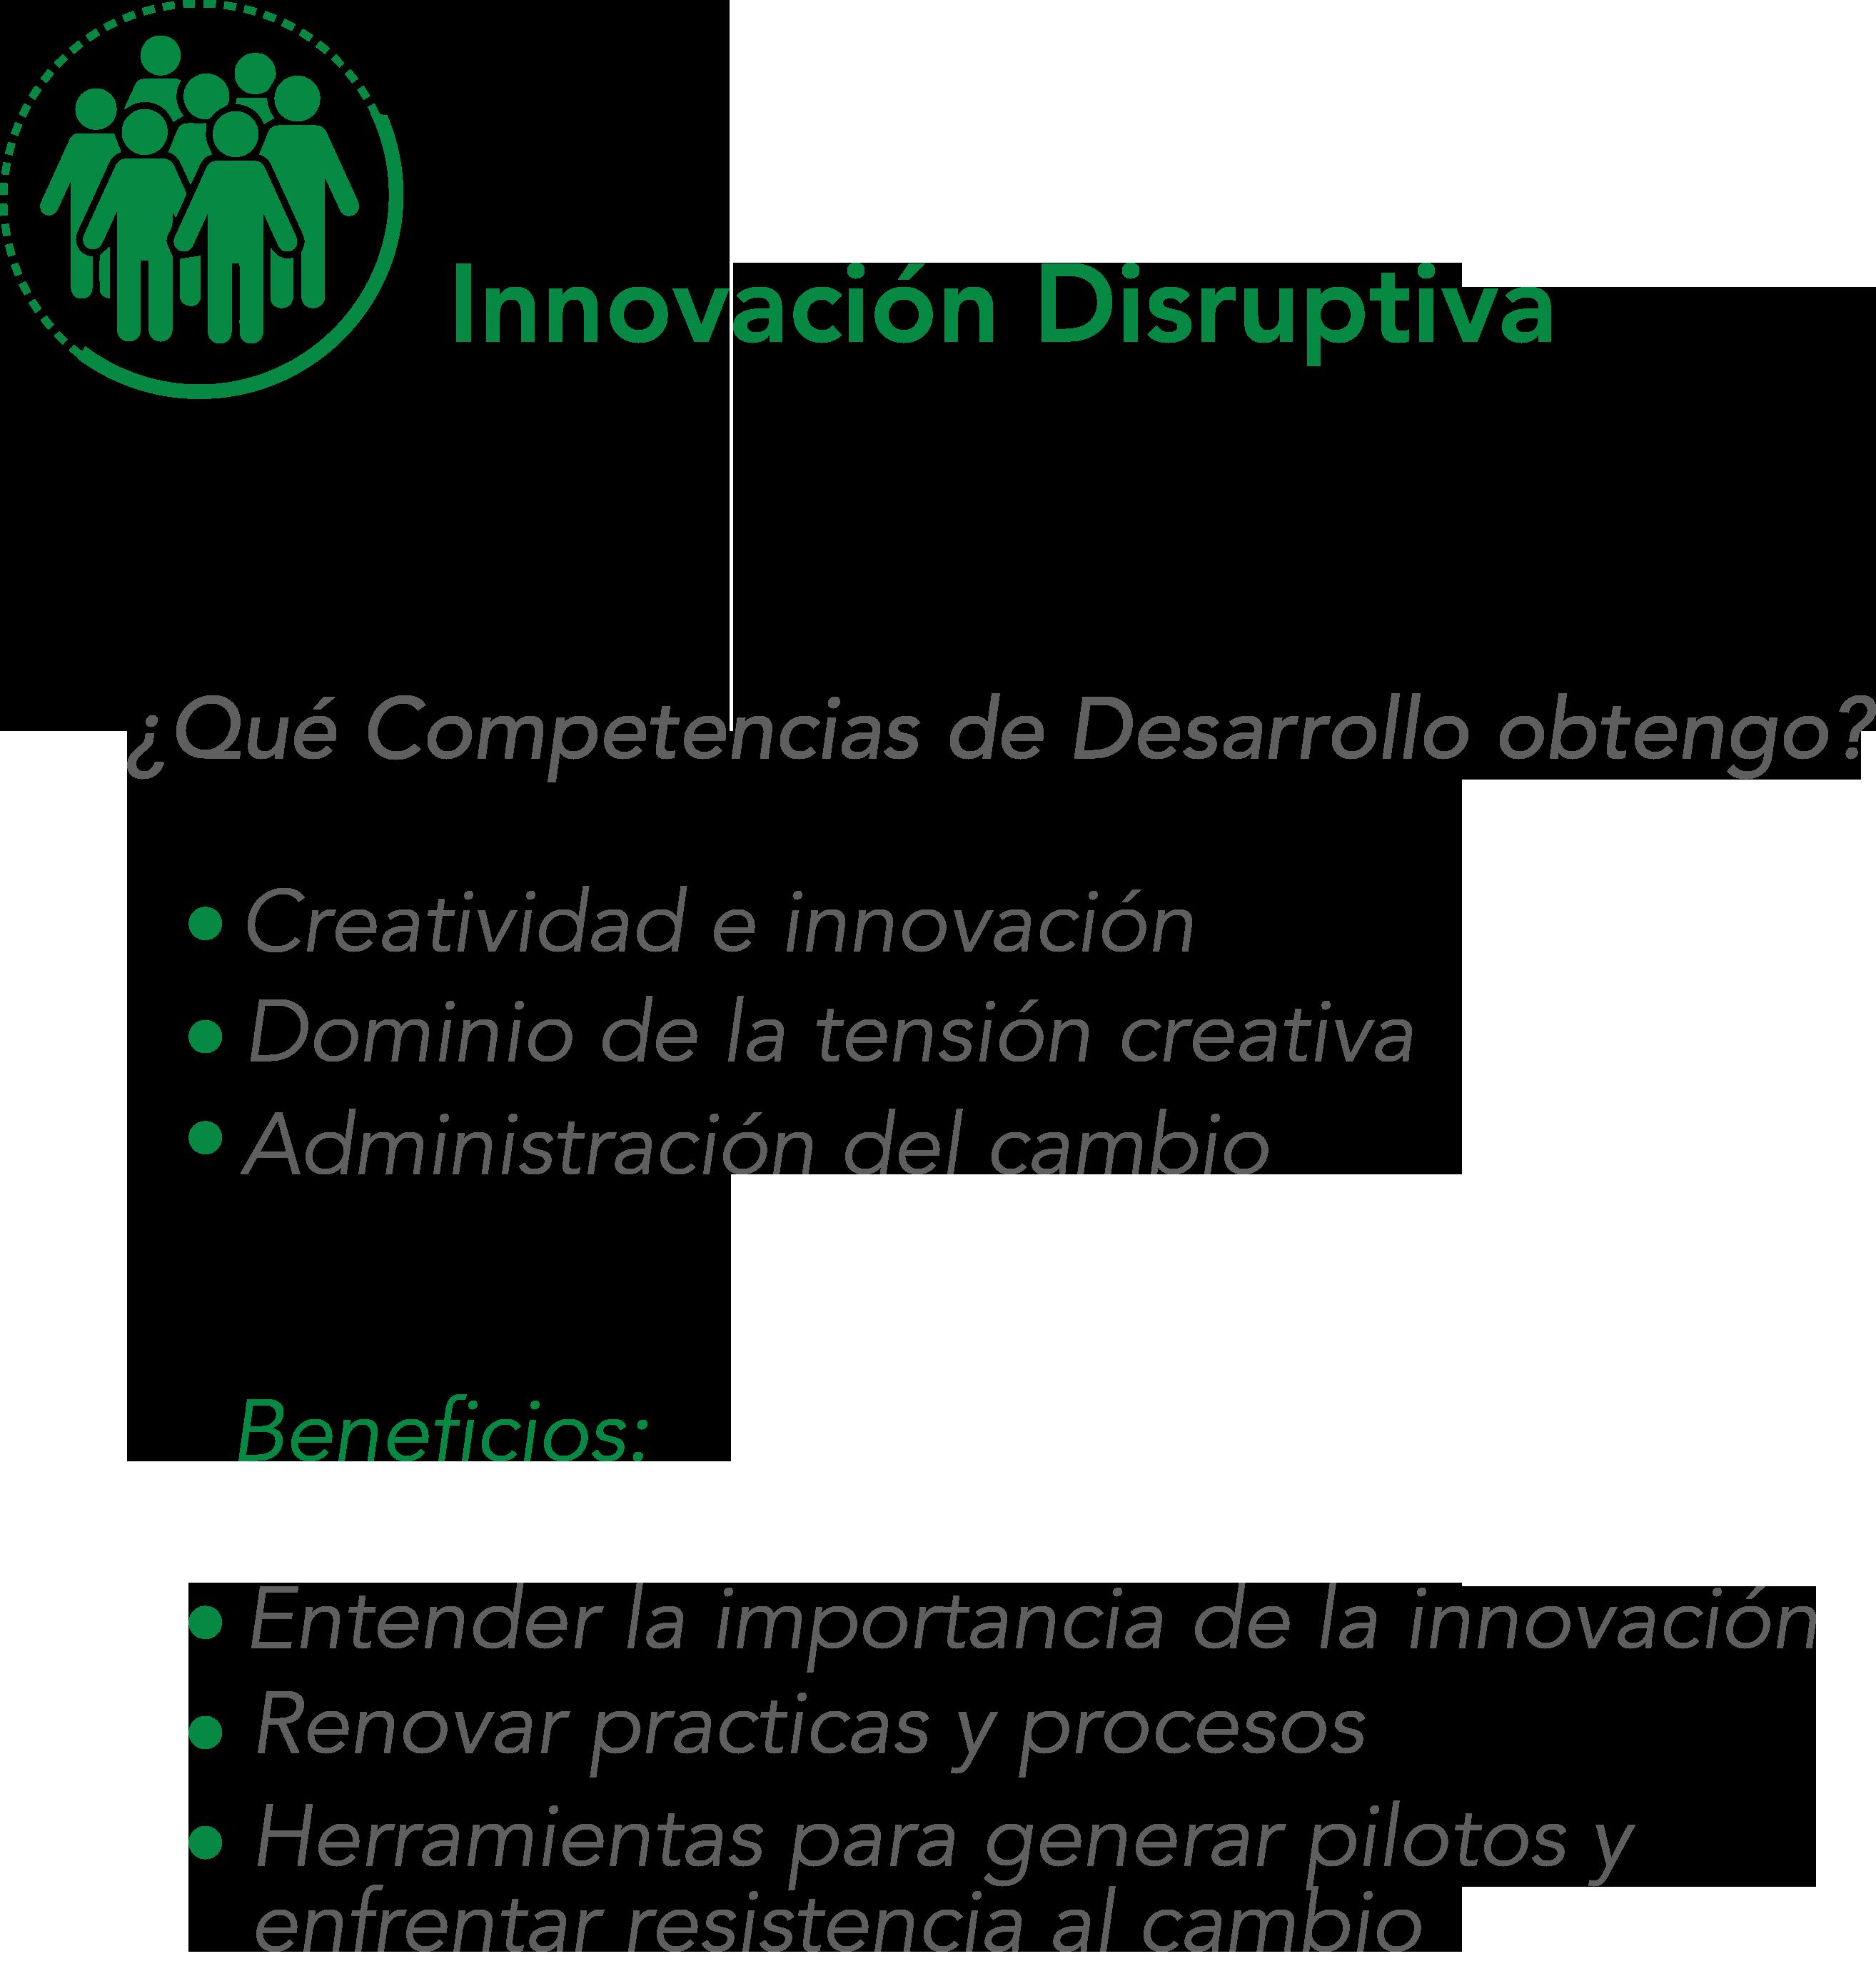 innovacion-disruptiva